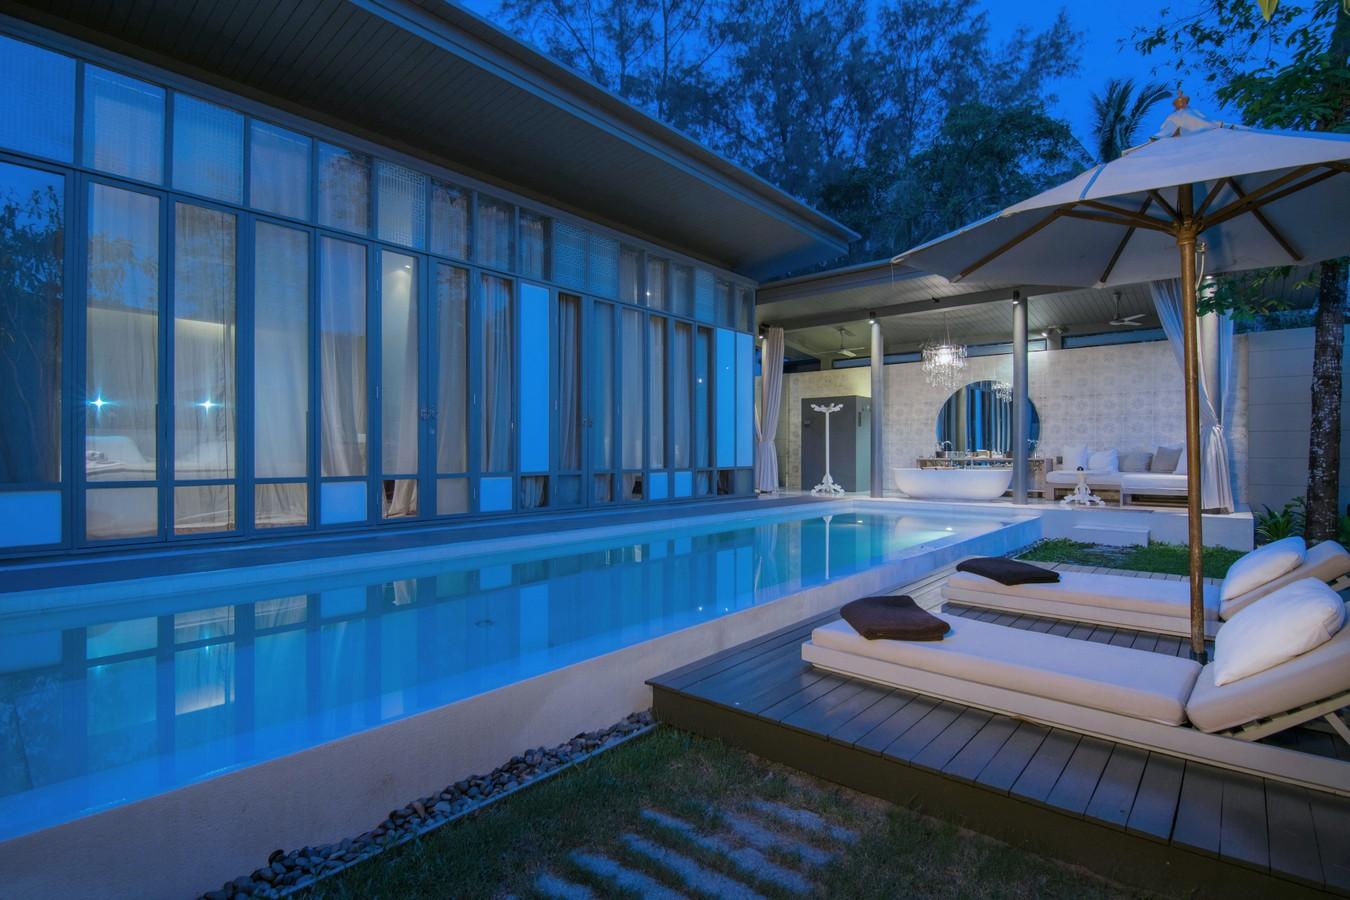 Sala phuket resort and spa yacht charter superyacht news for Hotel sala phuket